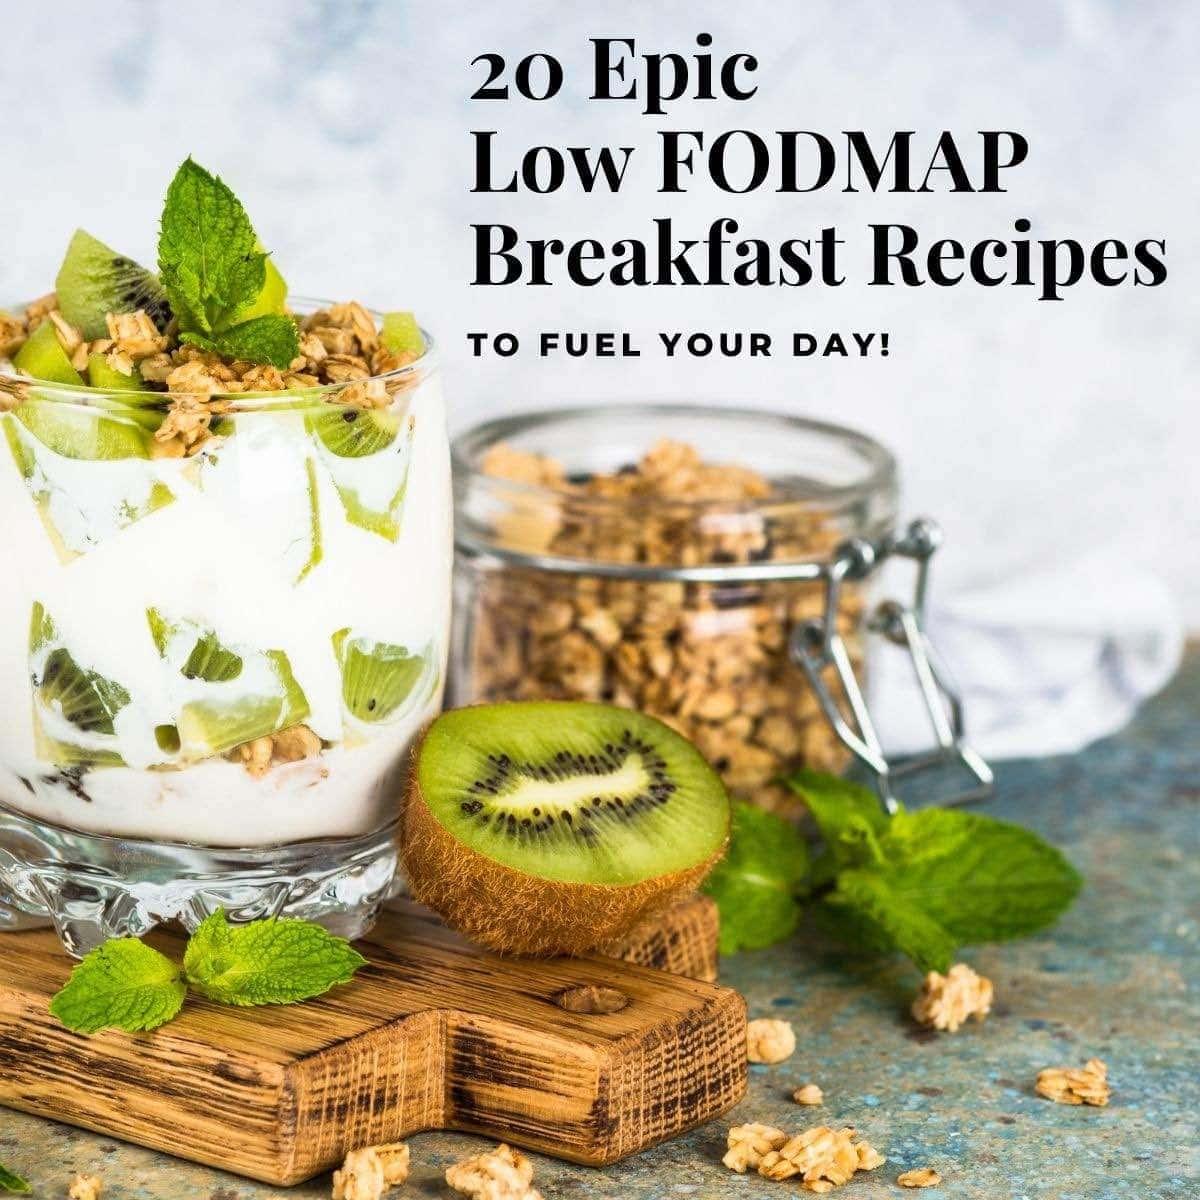 Low FODMAP Breakfast recipes = Kiwi granola parfait in a glass jar.